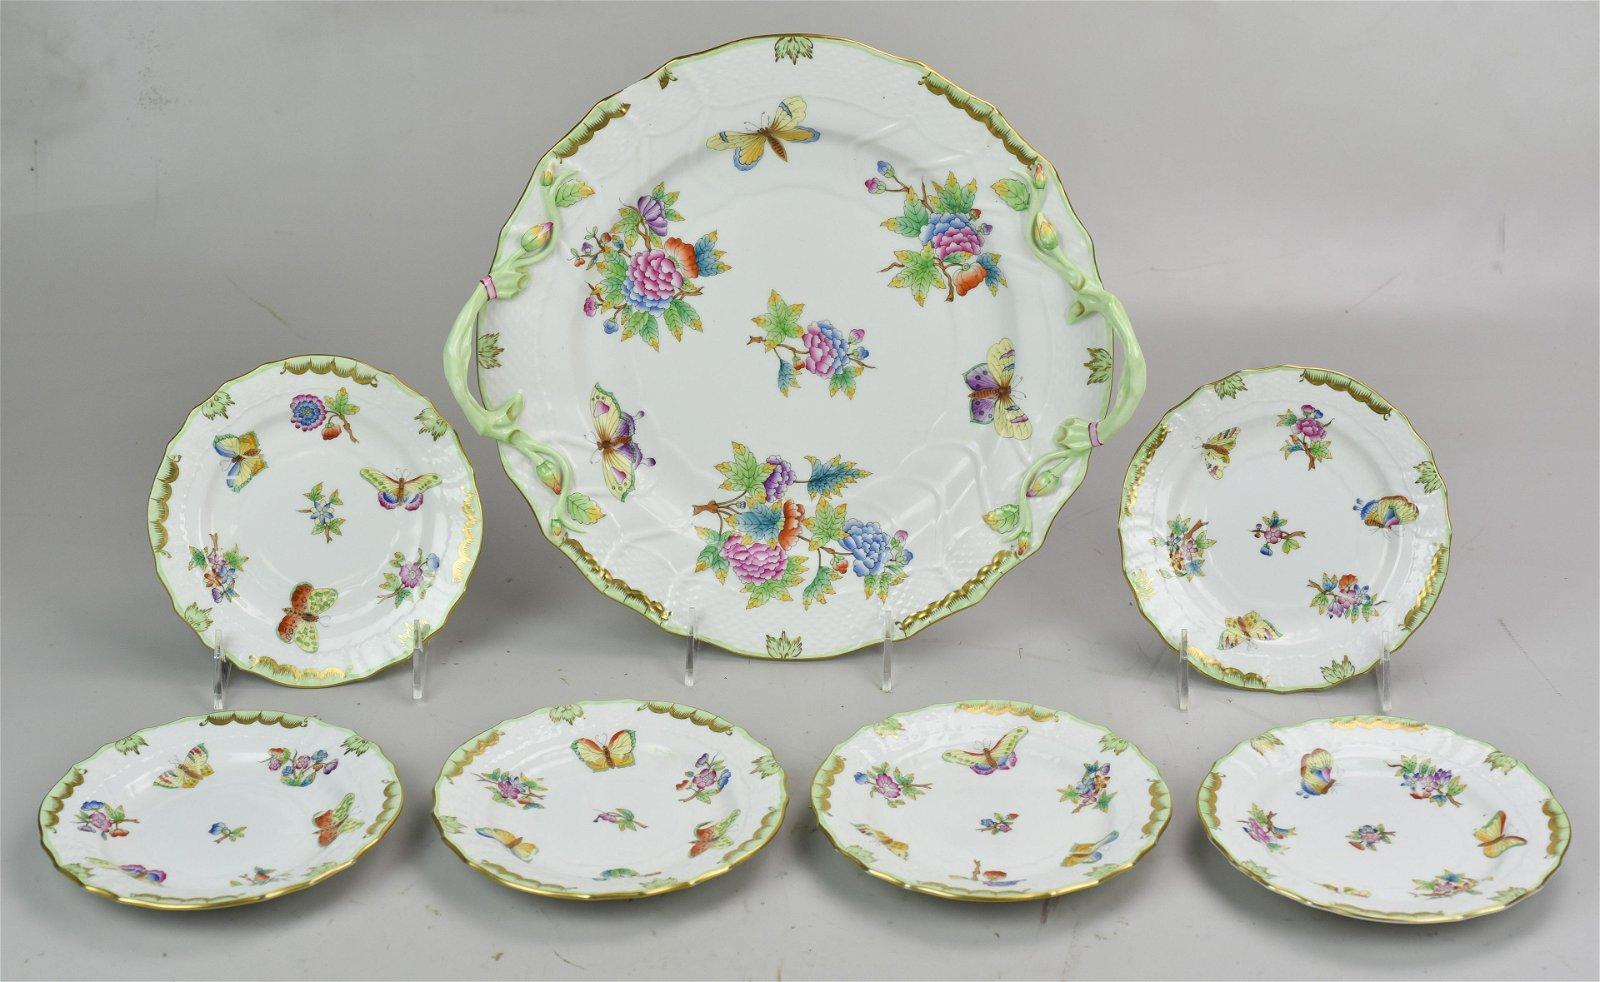 7-Pc Herend Queen Victoria Cake Set